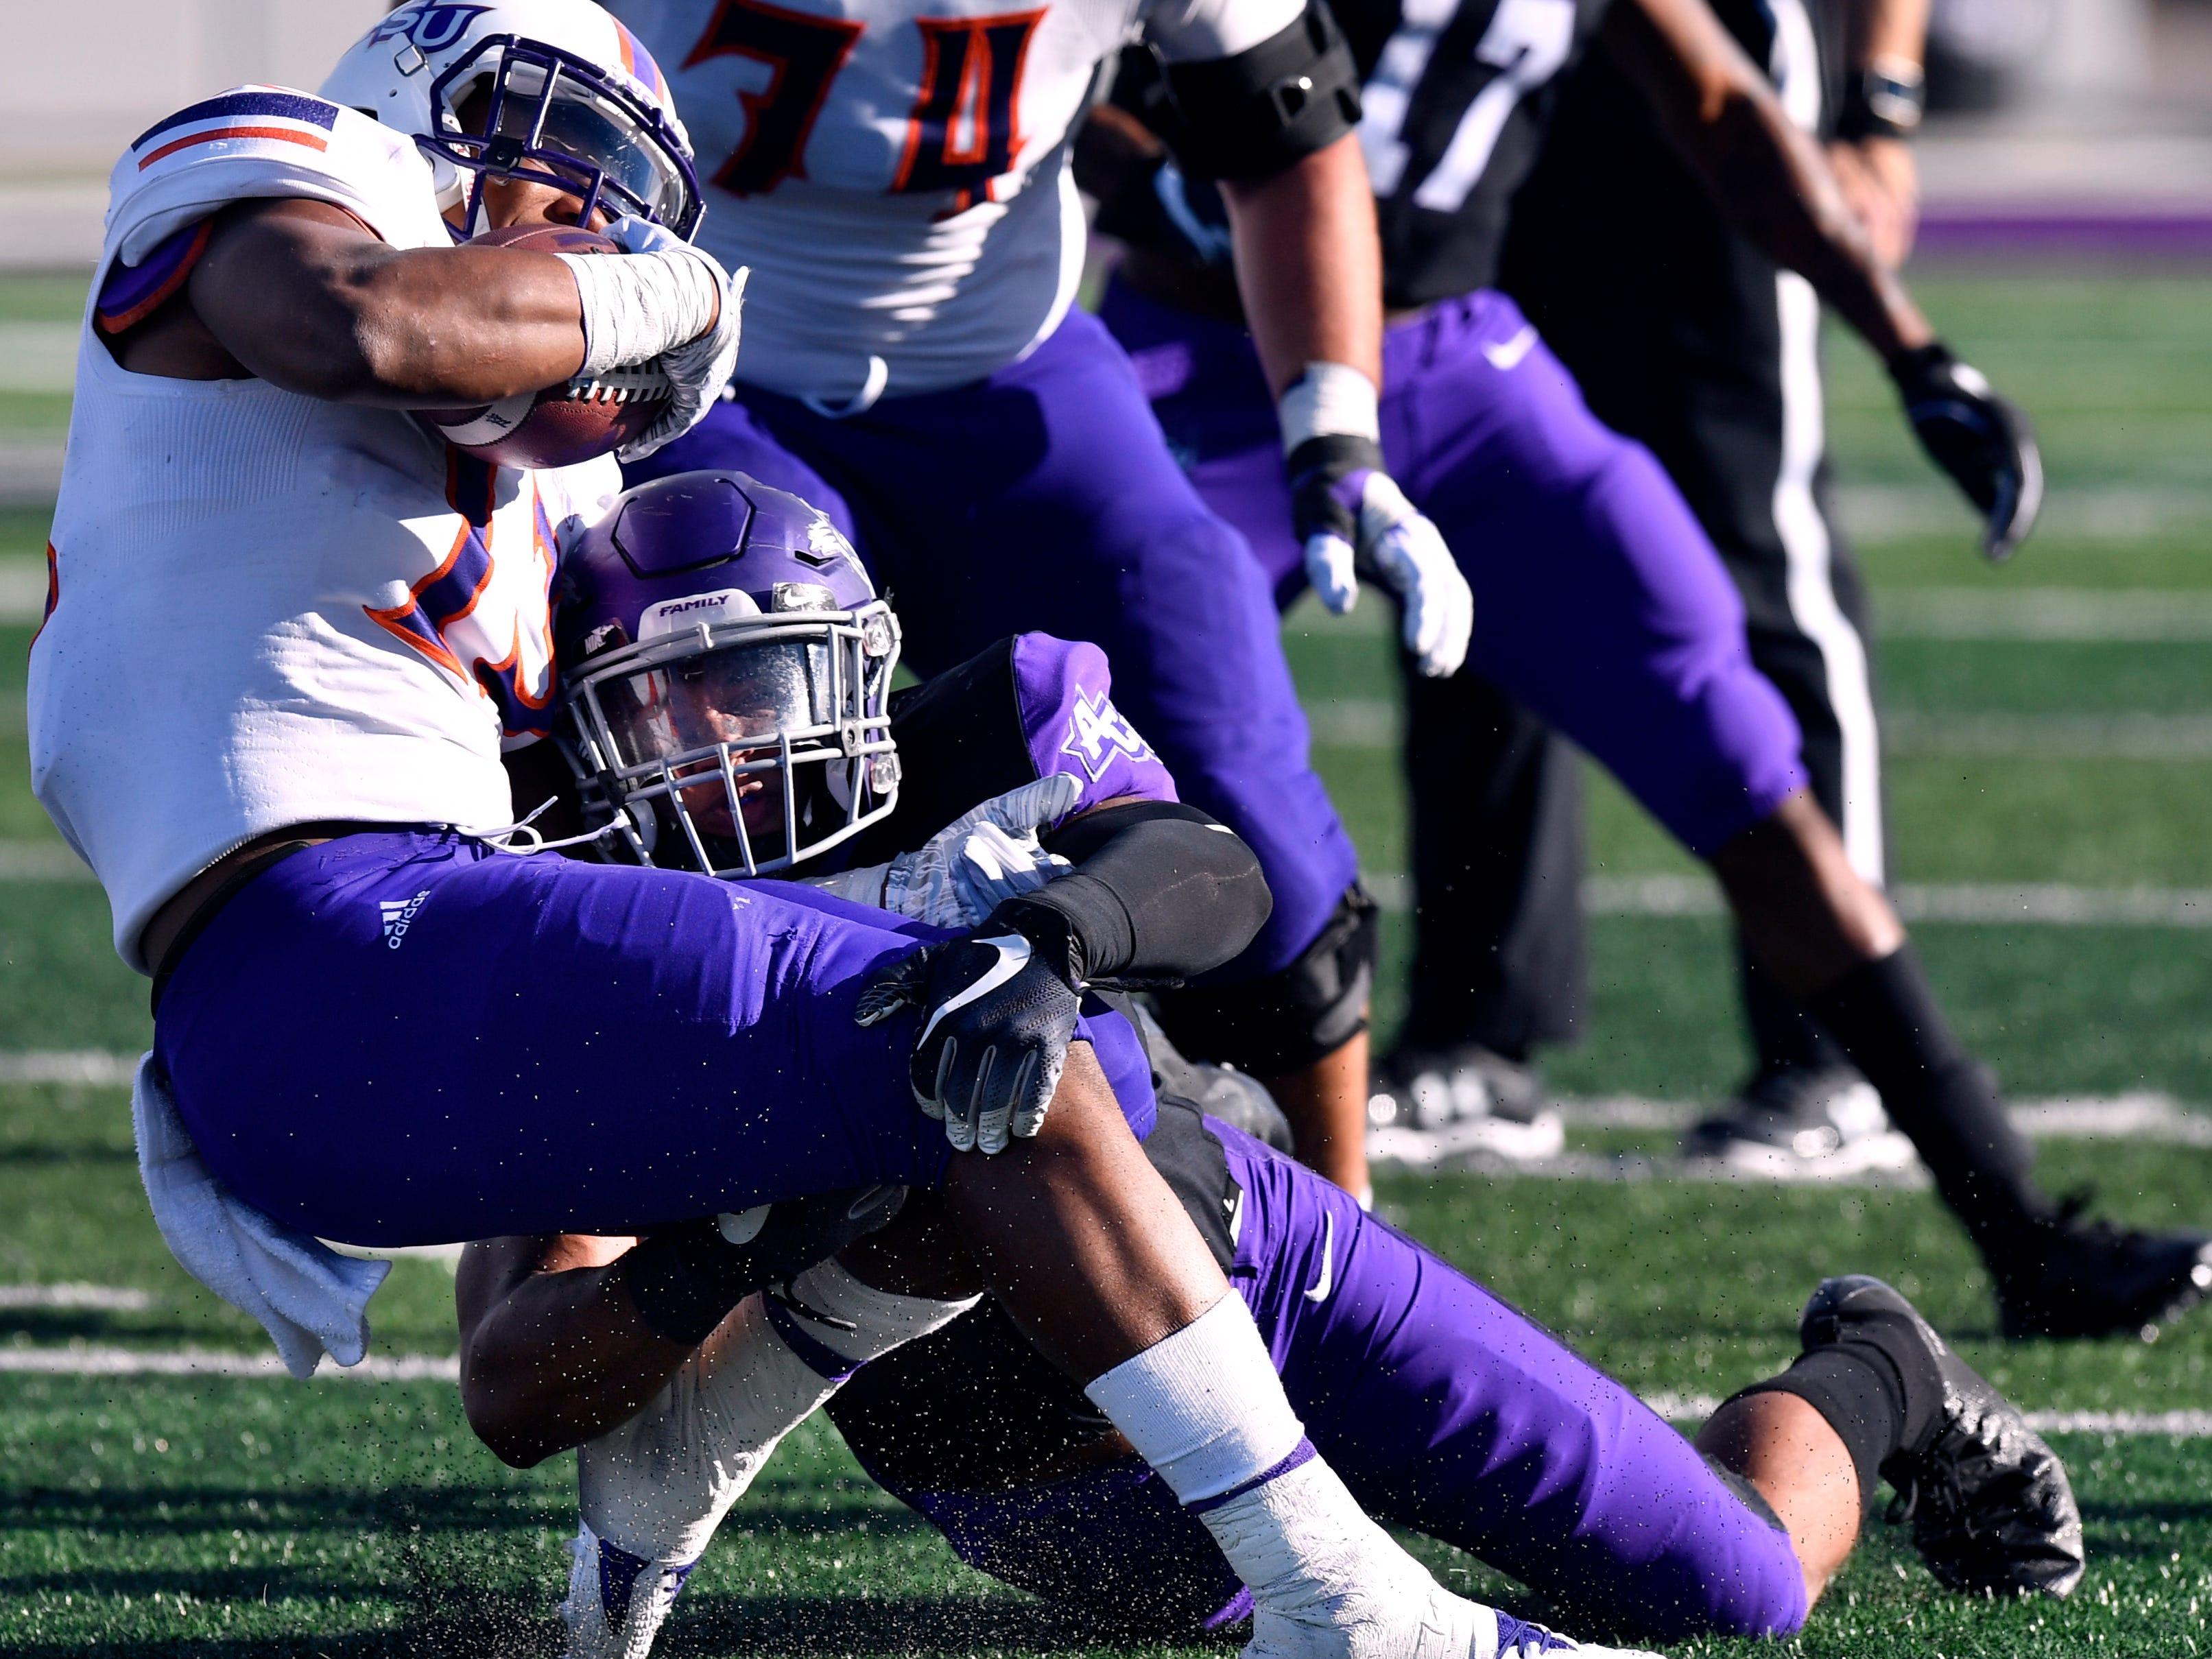 Abilene Christian linebacker Jeremiah Chambers tackles Northwestern State running back Stadford Anderson during Saturday's game Nov. 3, 2018. Final score was 49-47, Abilene Christian University.